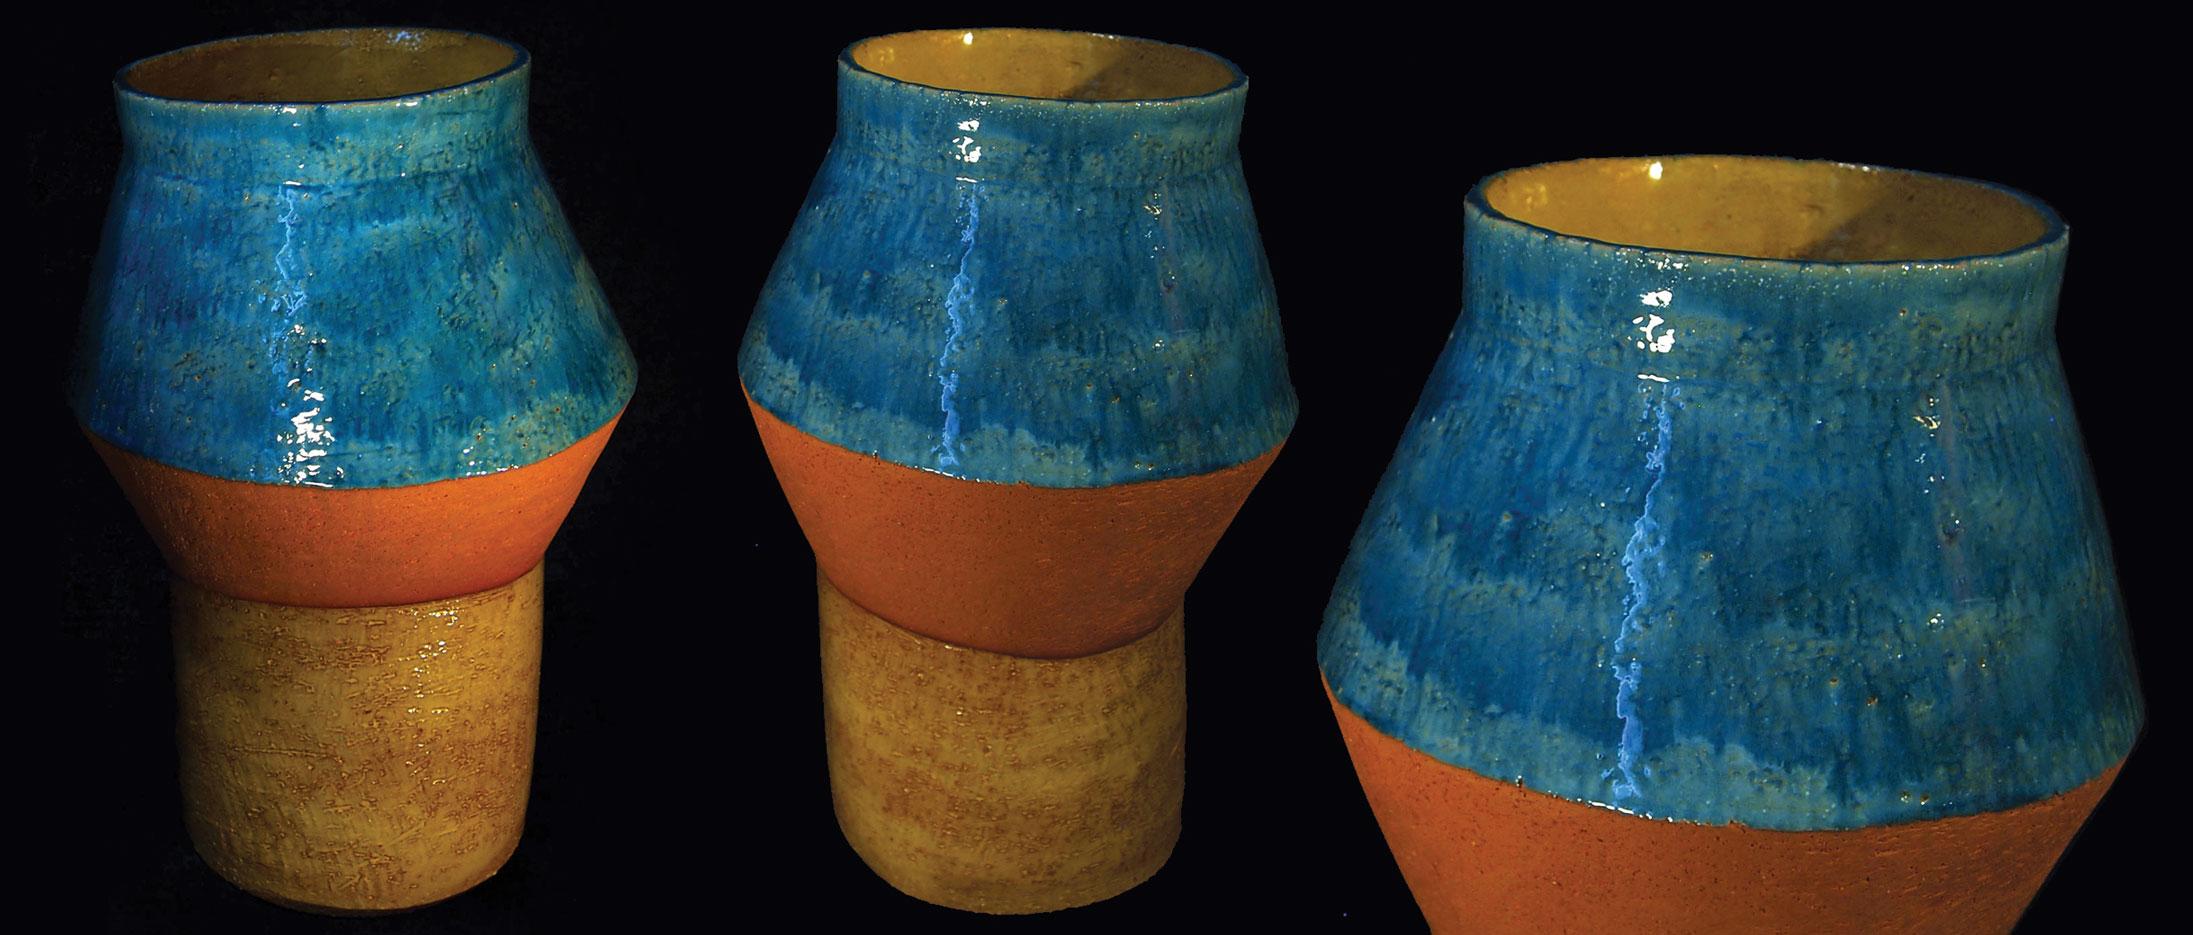 Vasi in Ceramica Serie Terra